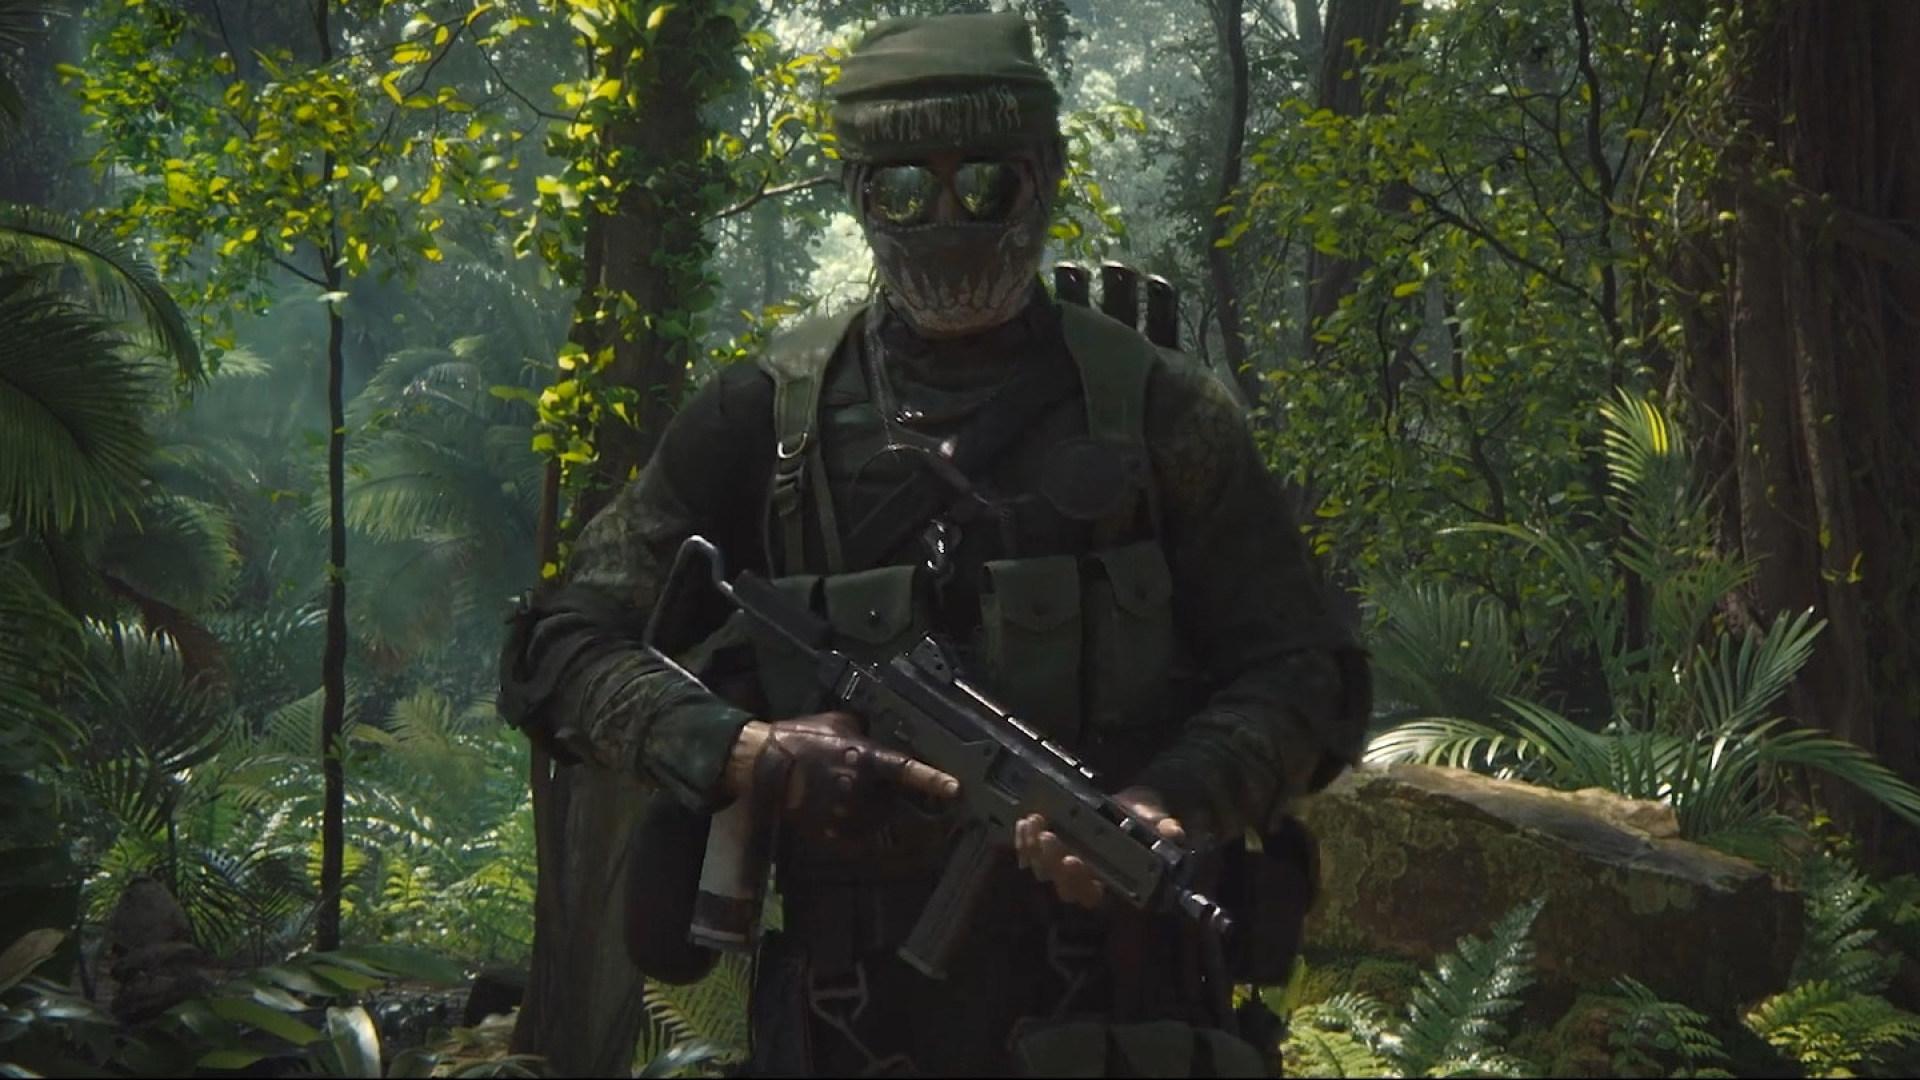 Trailer, Ego-Shooter, Shooter, Call of Duty, Dlc, Black Ops, Call of Duty: Black Ops, Call of Duty: Black Ops Cold War, Warzone, Black Ops Cold War, Call of Duty: Warzone